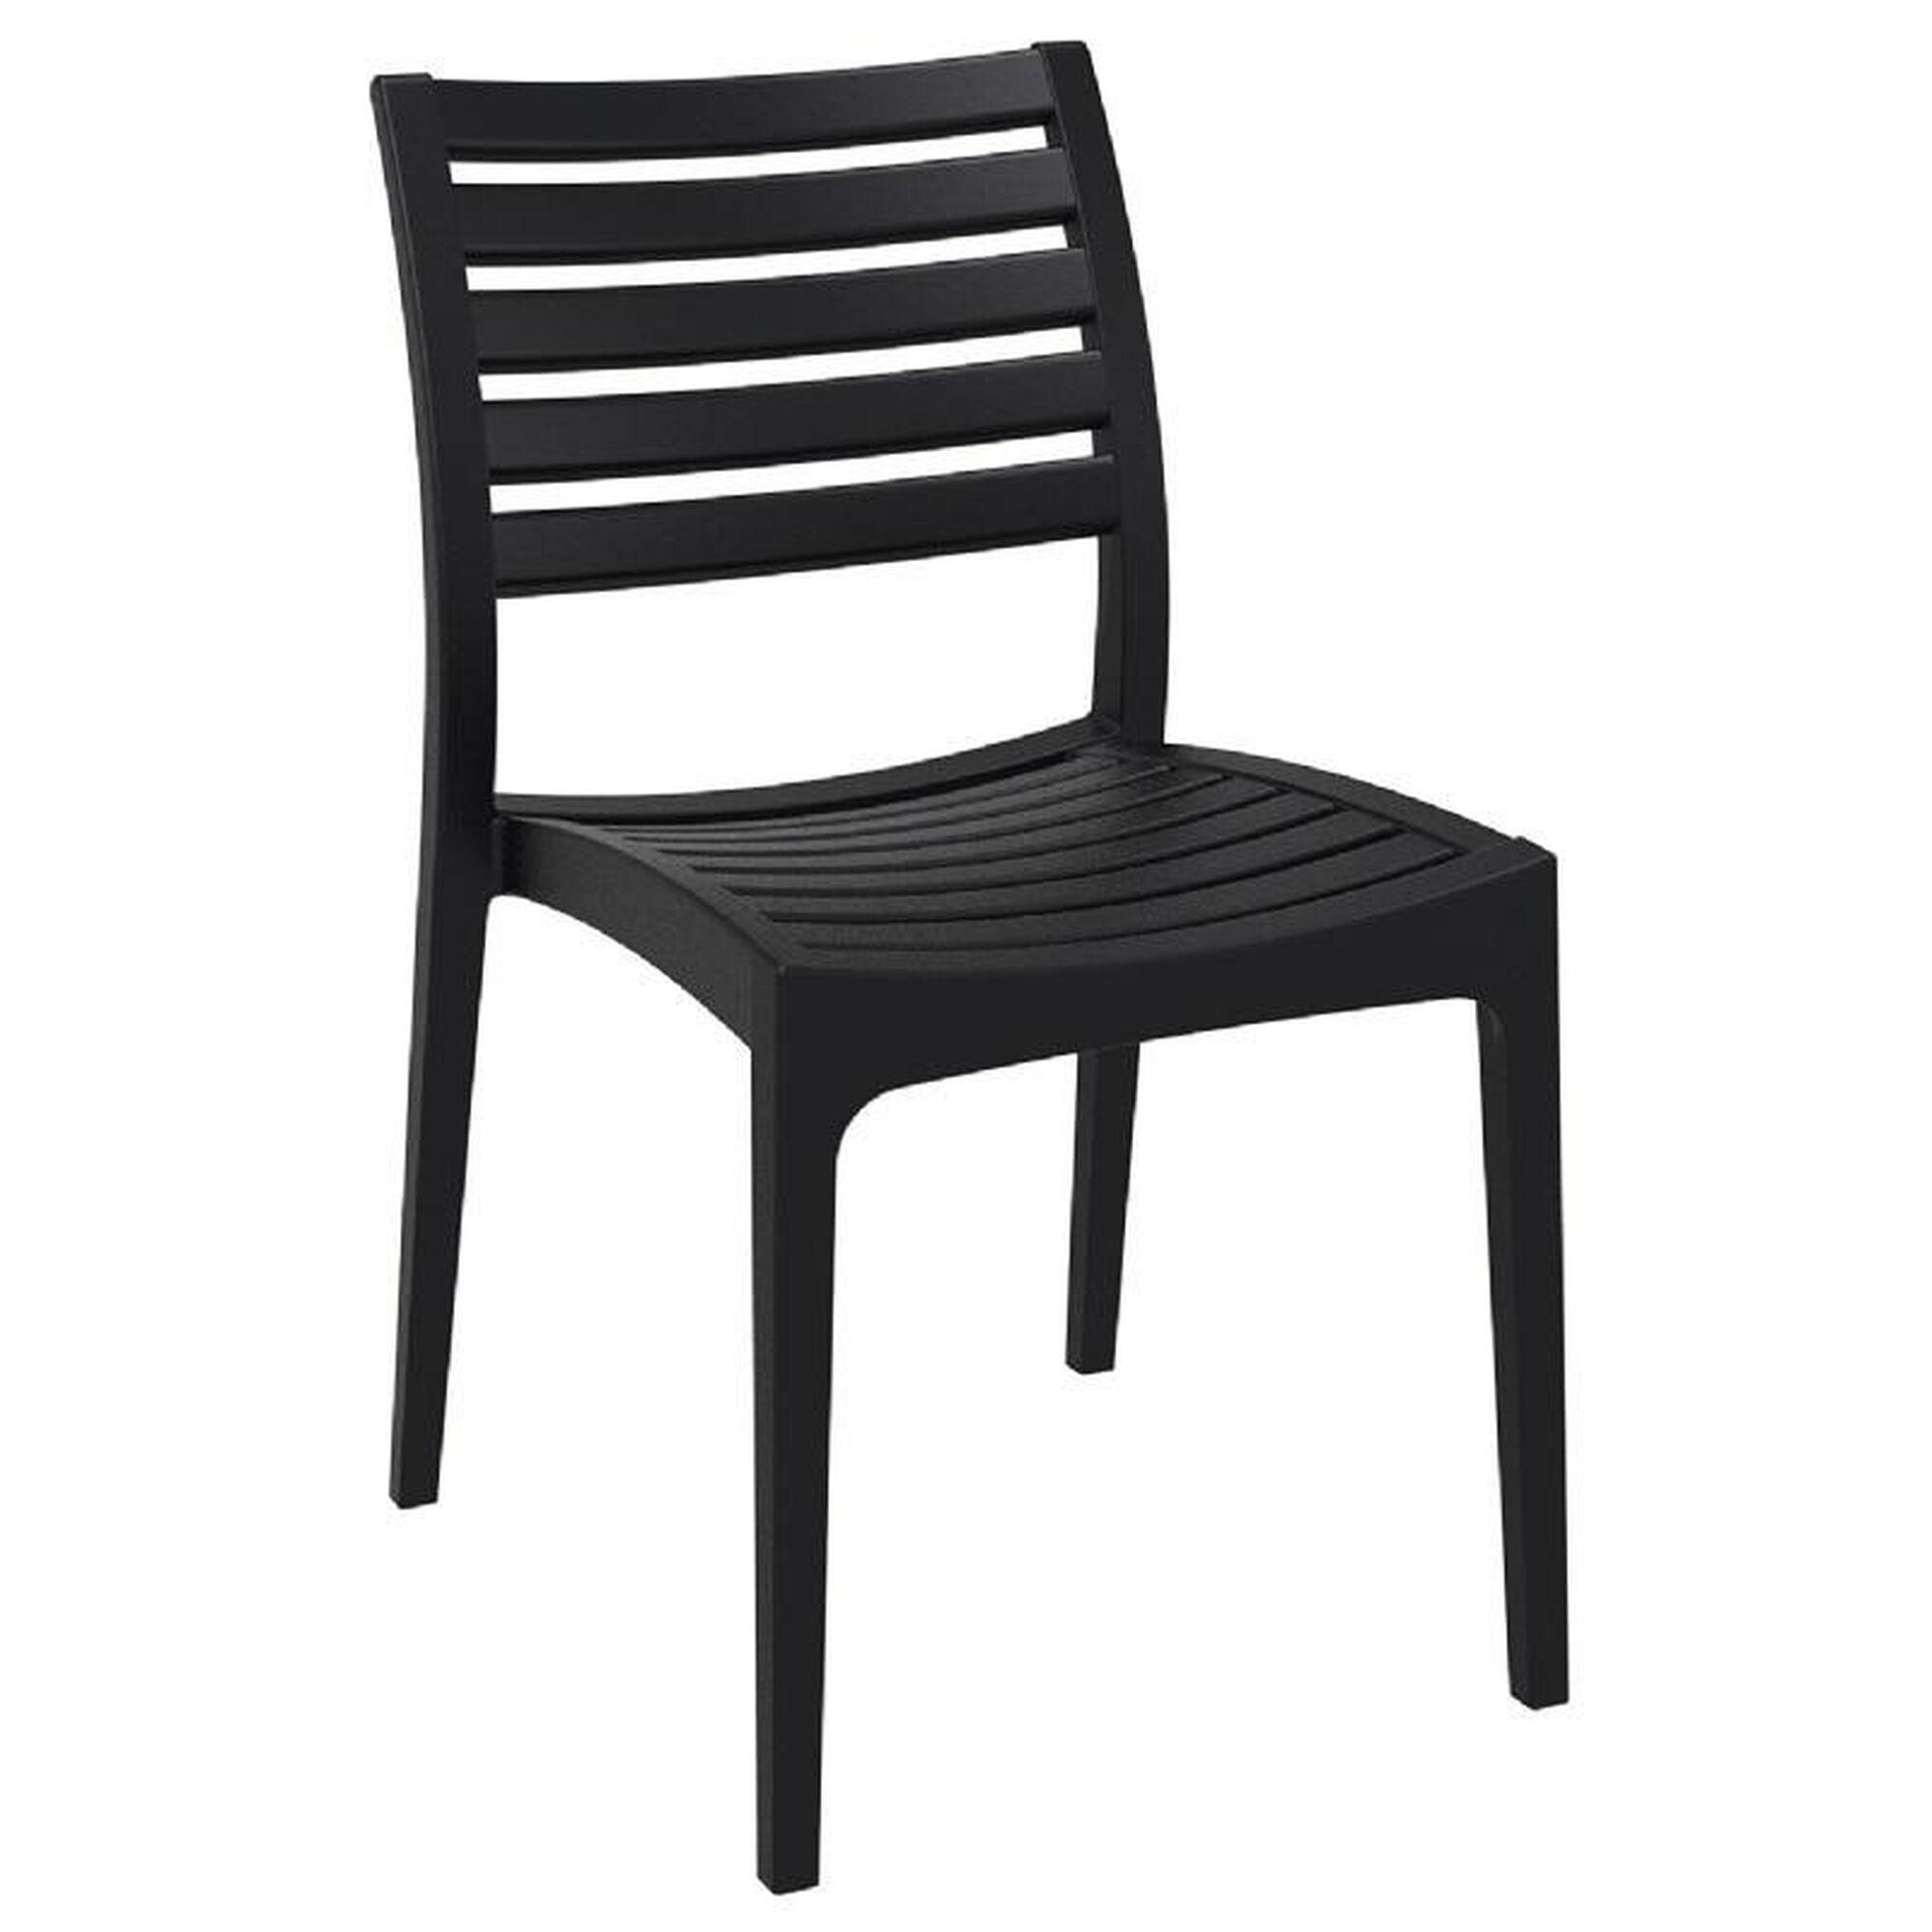 black stacking dining chair isp009 bla. Black Bedroom Furniture Sets. Home Design Ideas